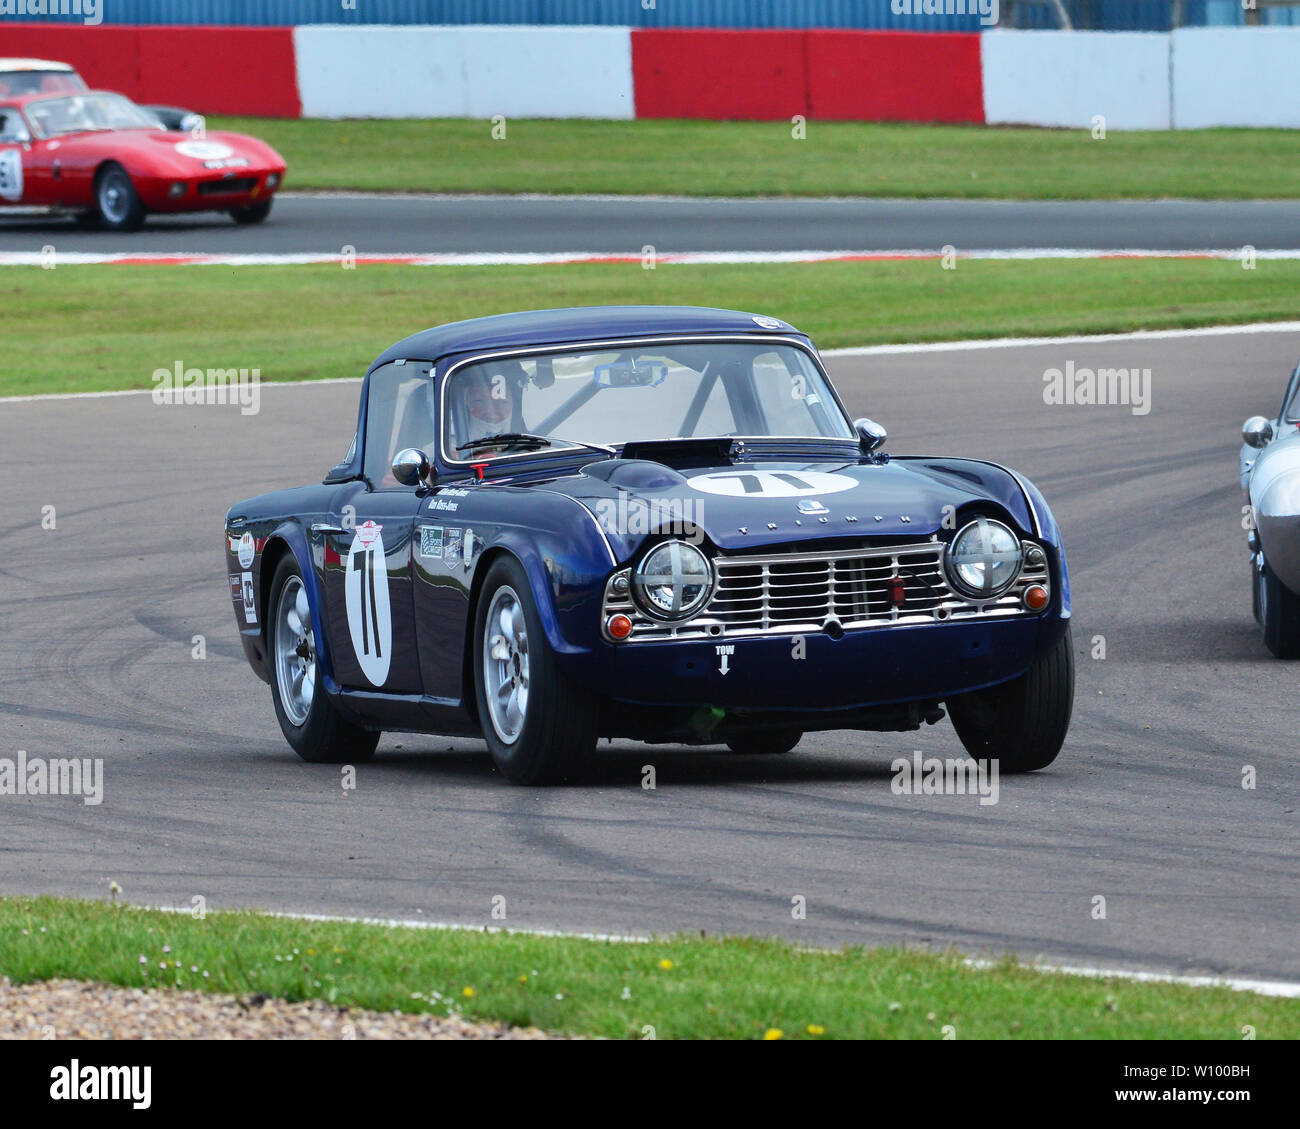 Alan Ross-Jones, Daniel Ross-Jones, Triumph TR4, GT & Sports Car Cup, Pre-66 GT Cars, Pre-63 Sports Cars, Donington Historic Festival, May 2019, motor - Stock Image